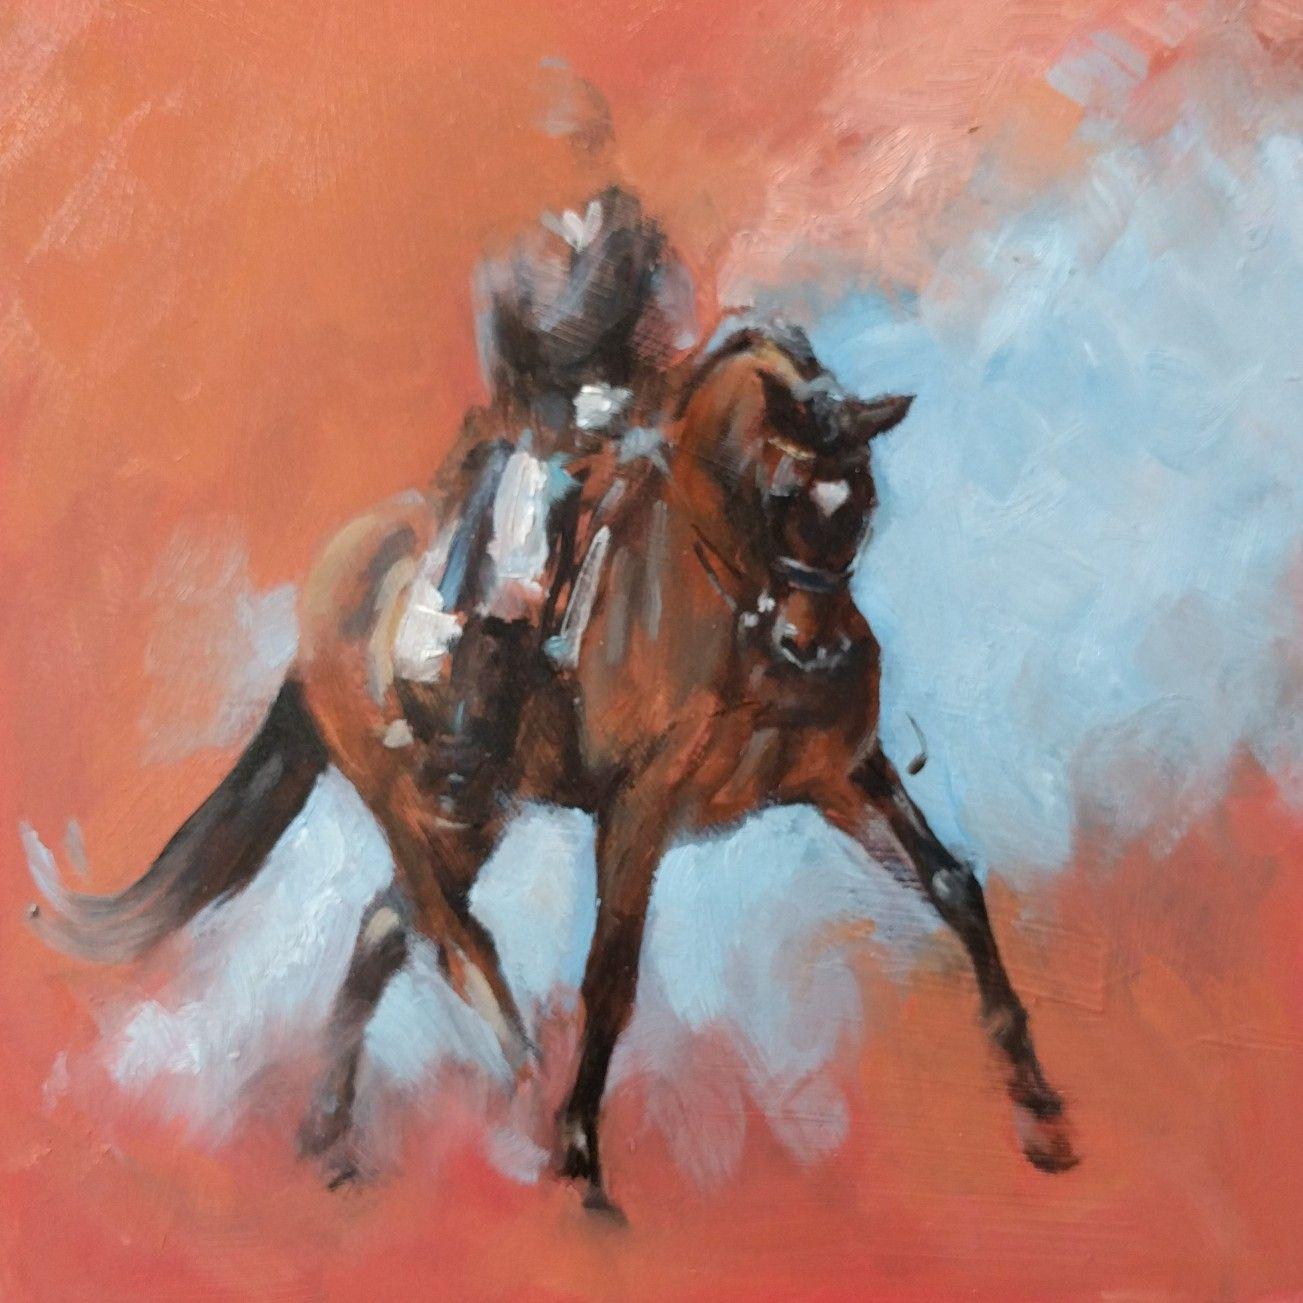 Oil sketch on panel 230117 Zazou Oo seven x Ferro x Belisar/Cath Driessen